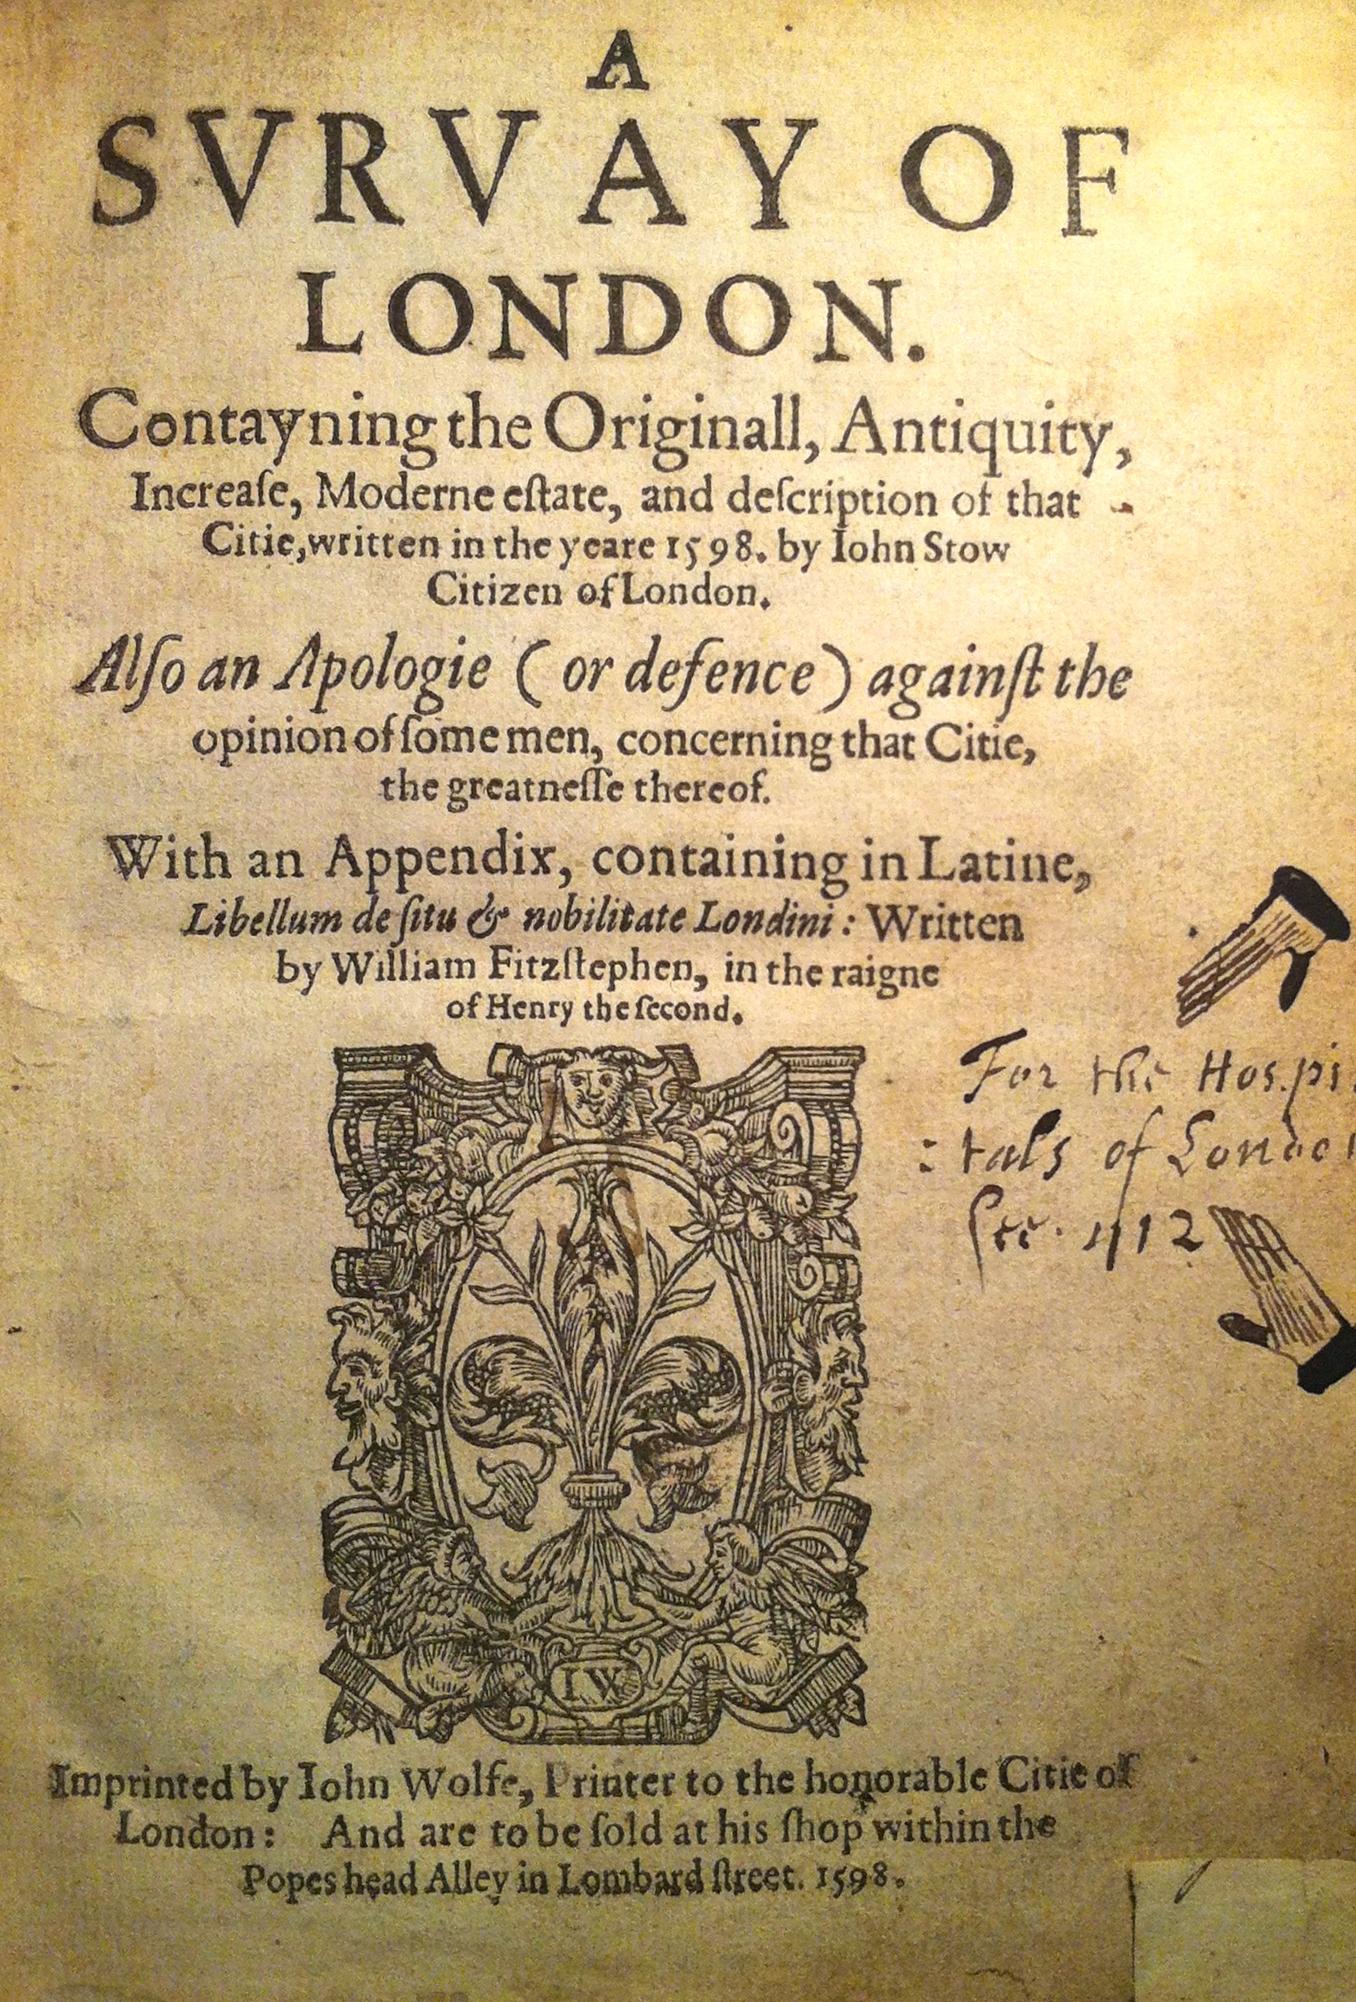 John Stow's 1598 Survey of London.